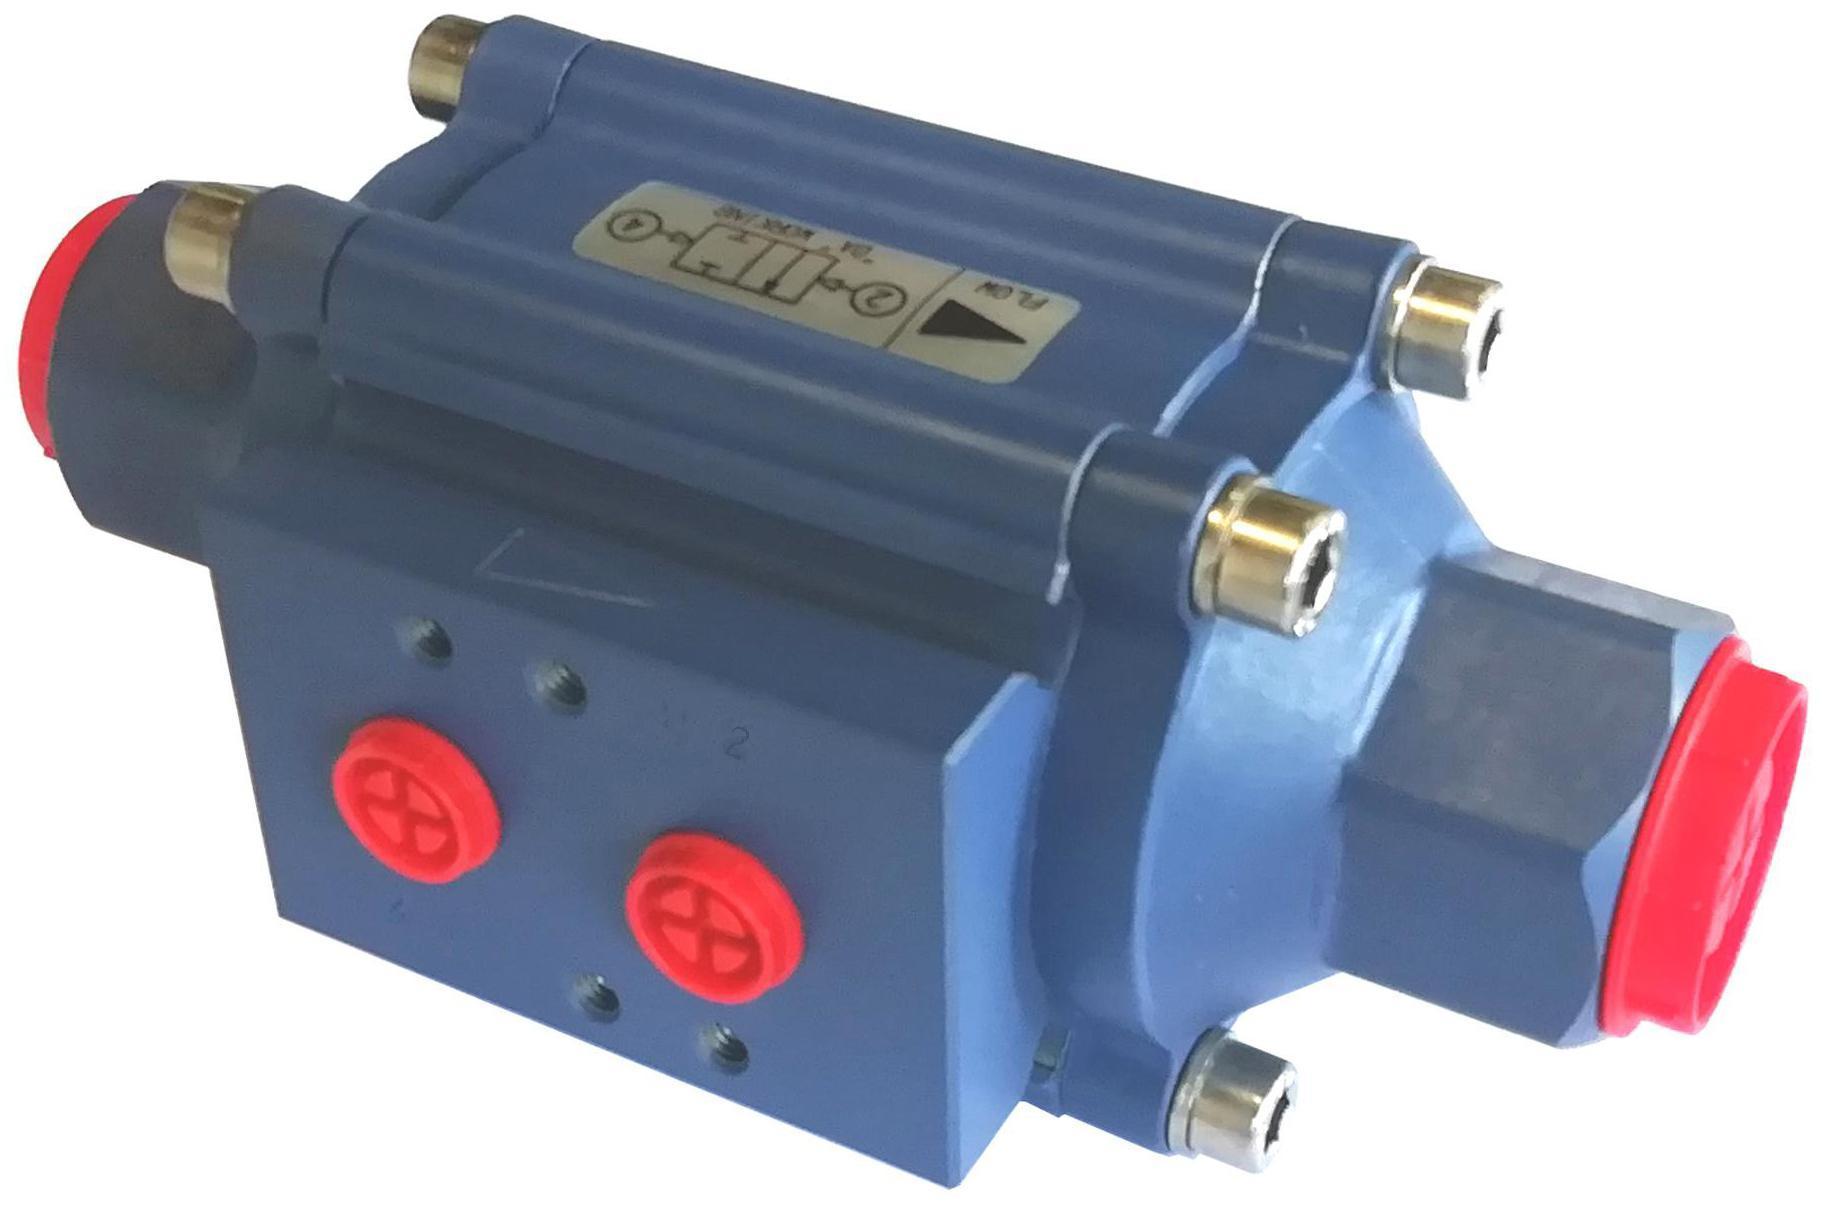 Power-tork PTFE Coated Aluminium Coaxial Valve